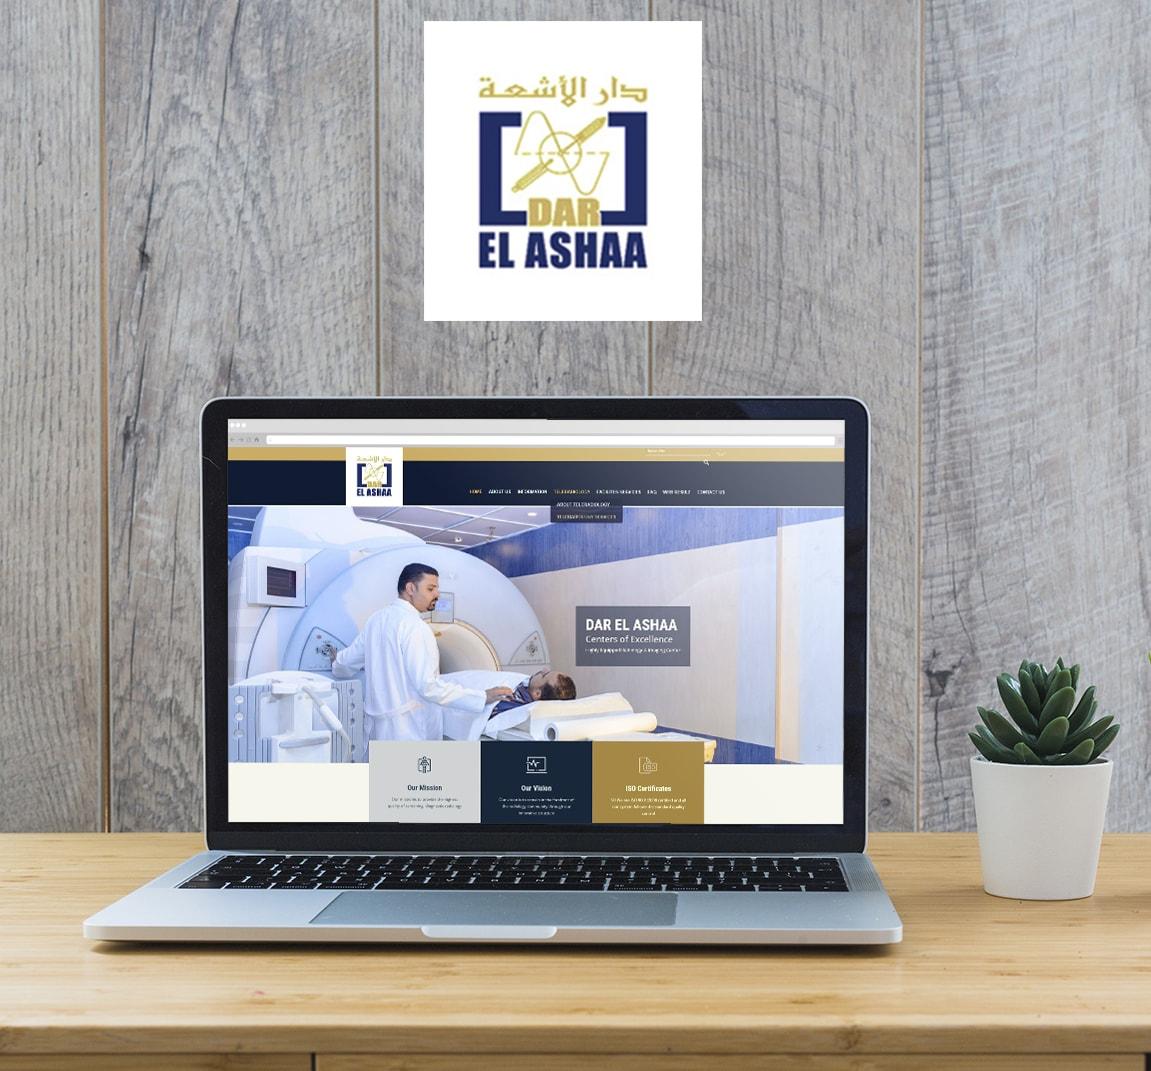 Alex Web Design, website development and mobile app development company clients in Egypt - Dar Elashaa